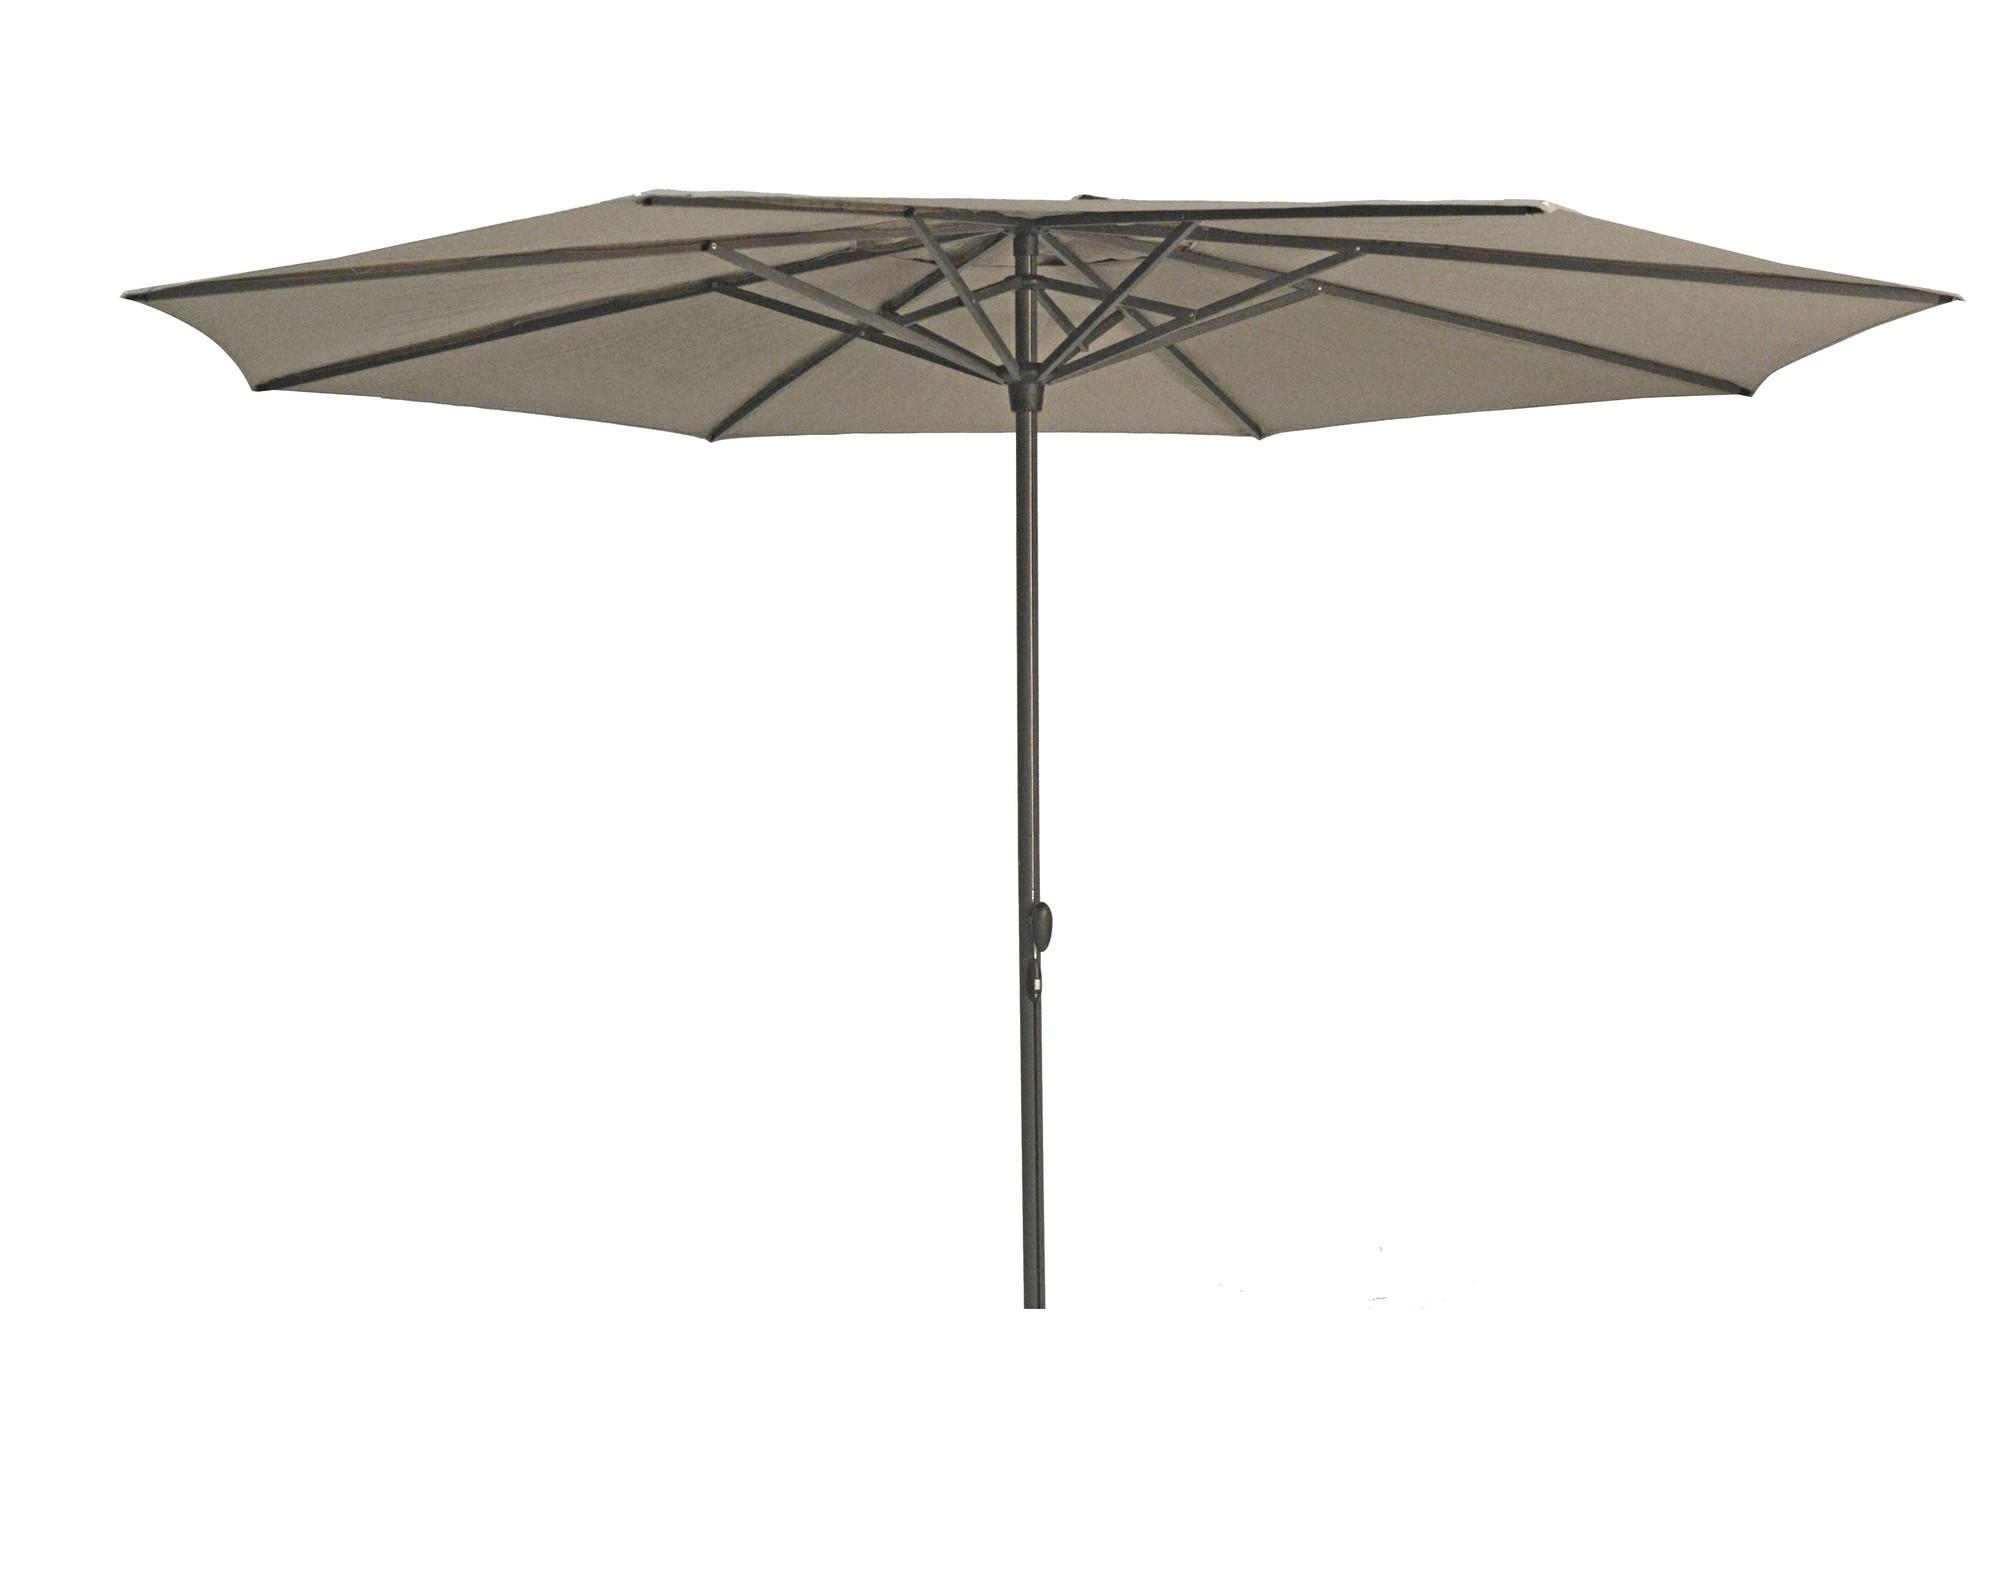 Stokparasol Sintra parasol dia 330 cm taupe